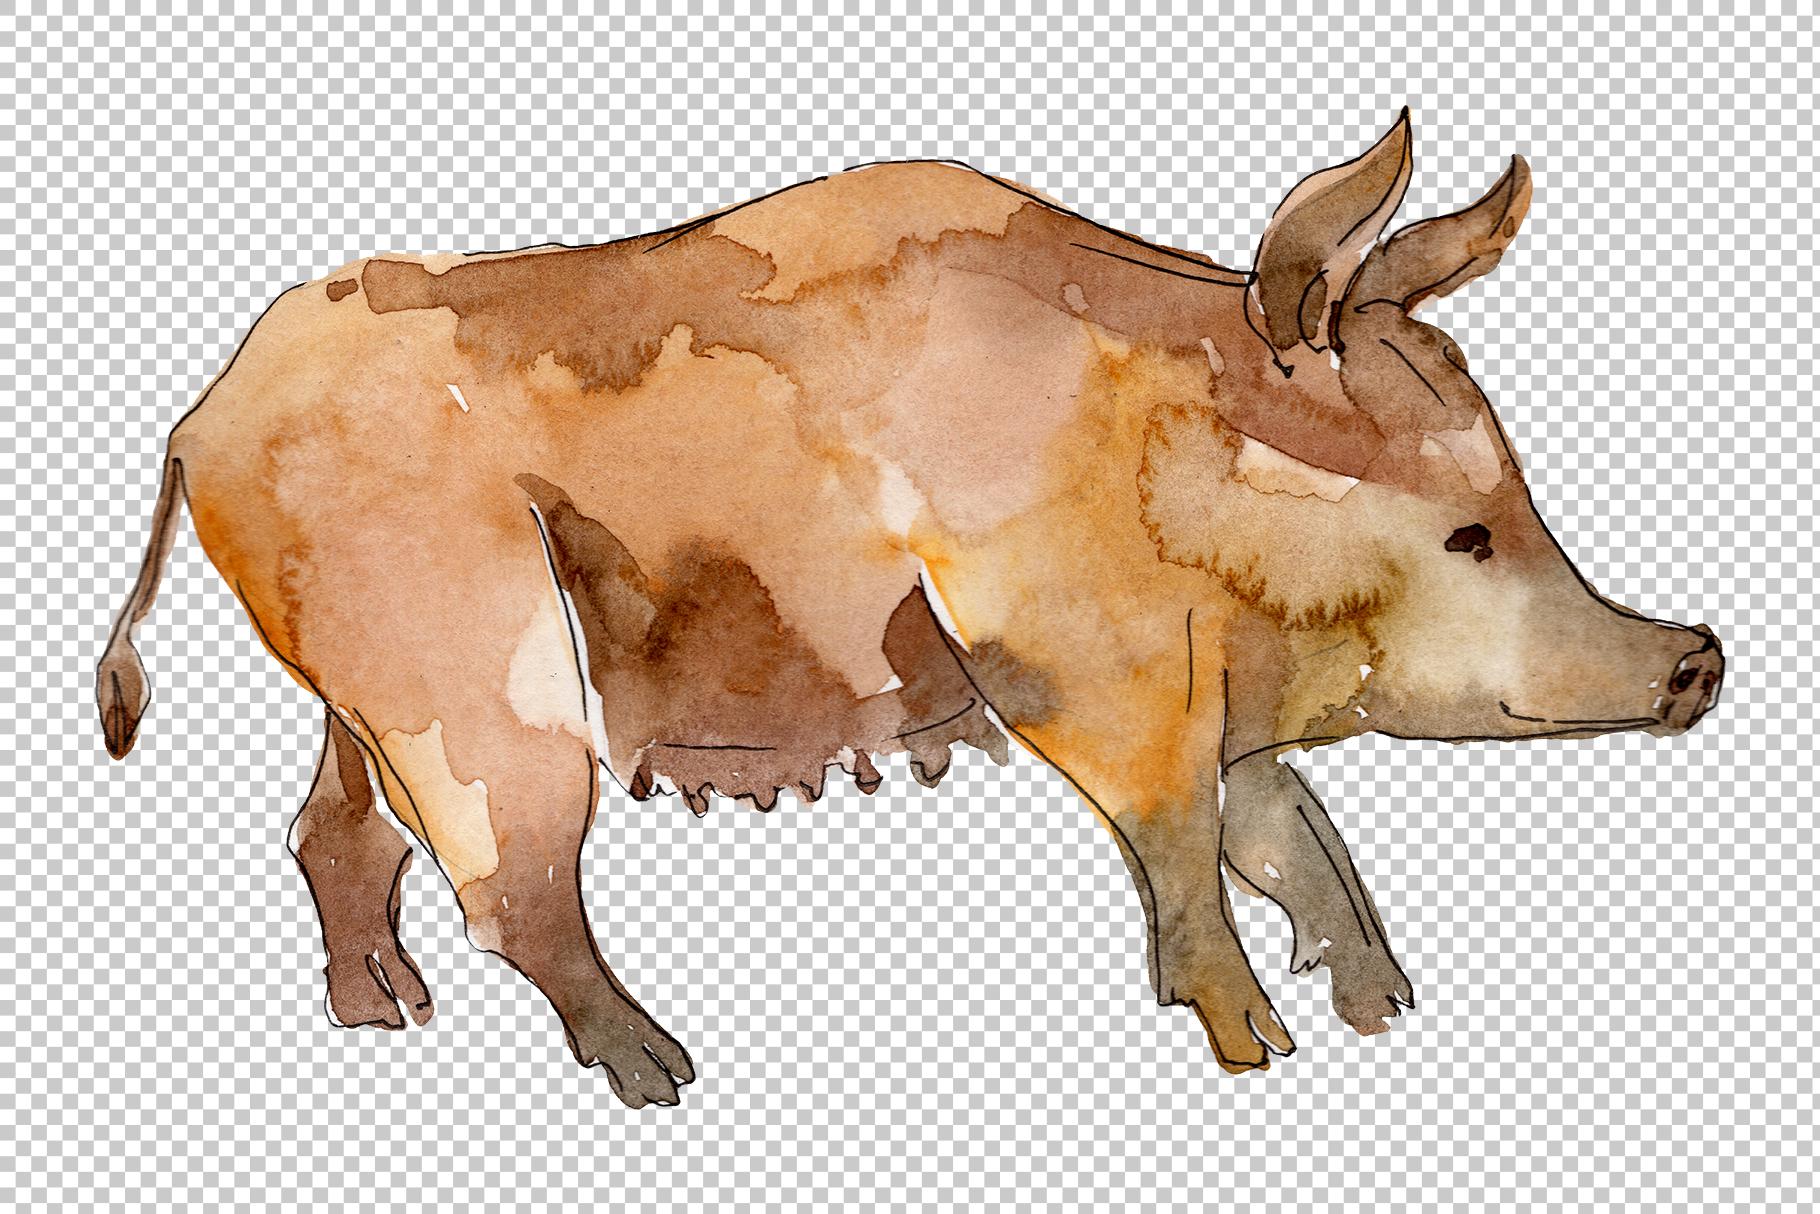 Farm animals pig boar Watercolor png example image 5